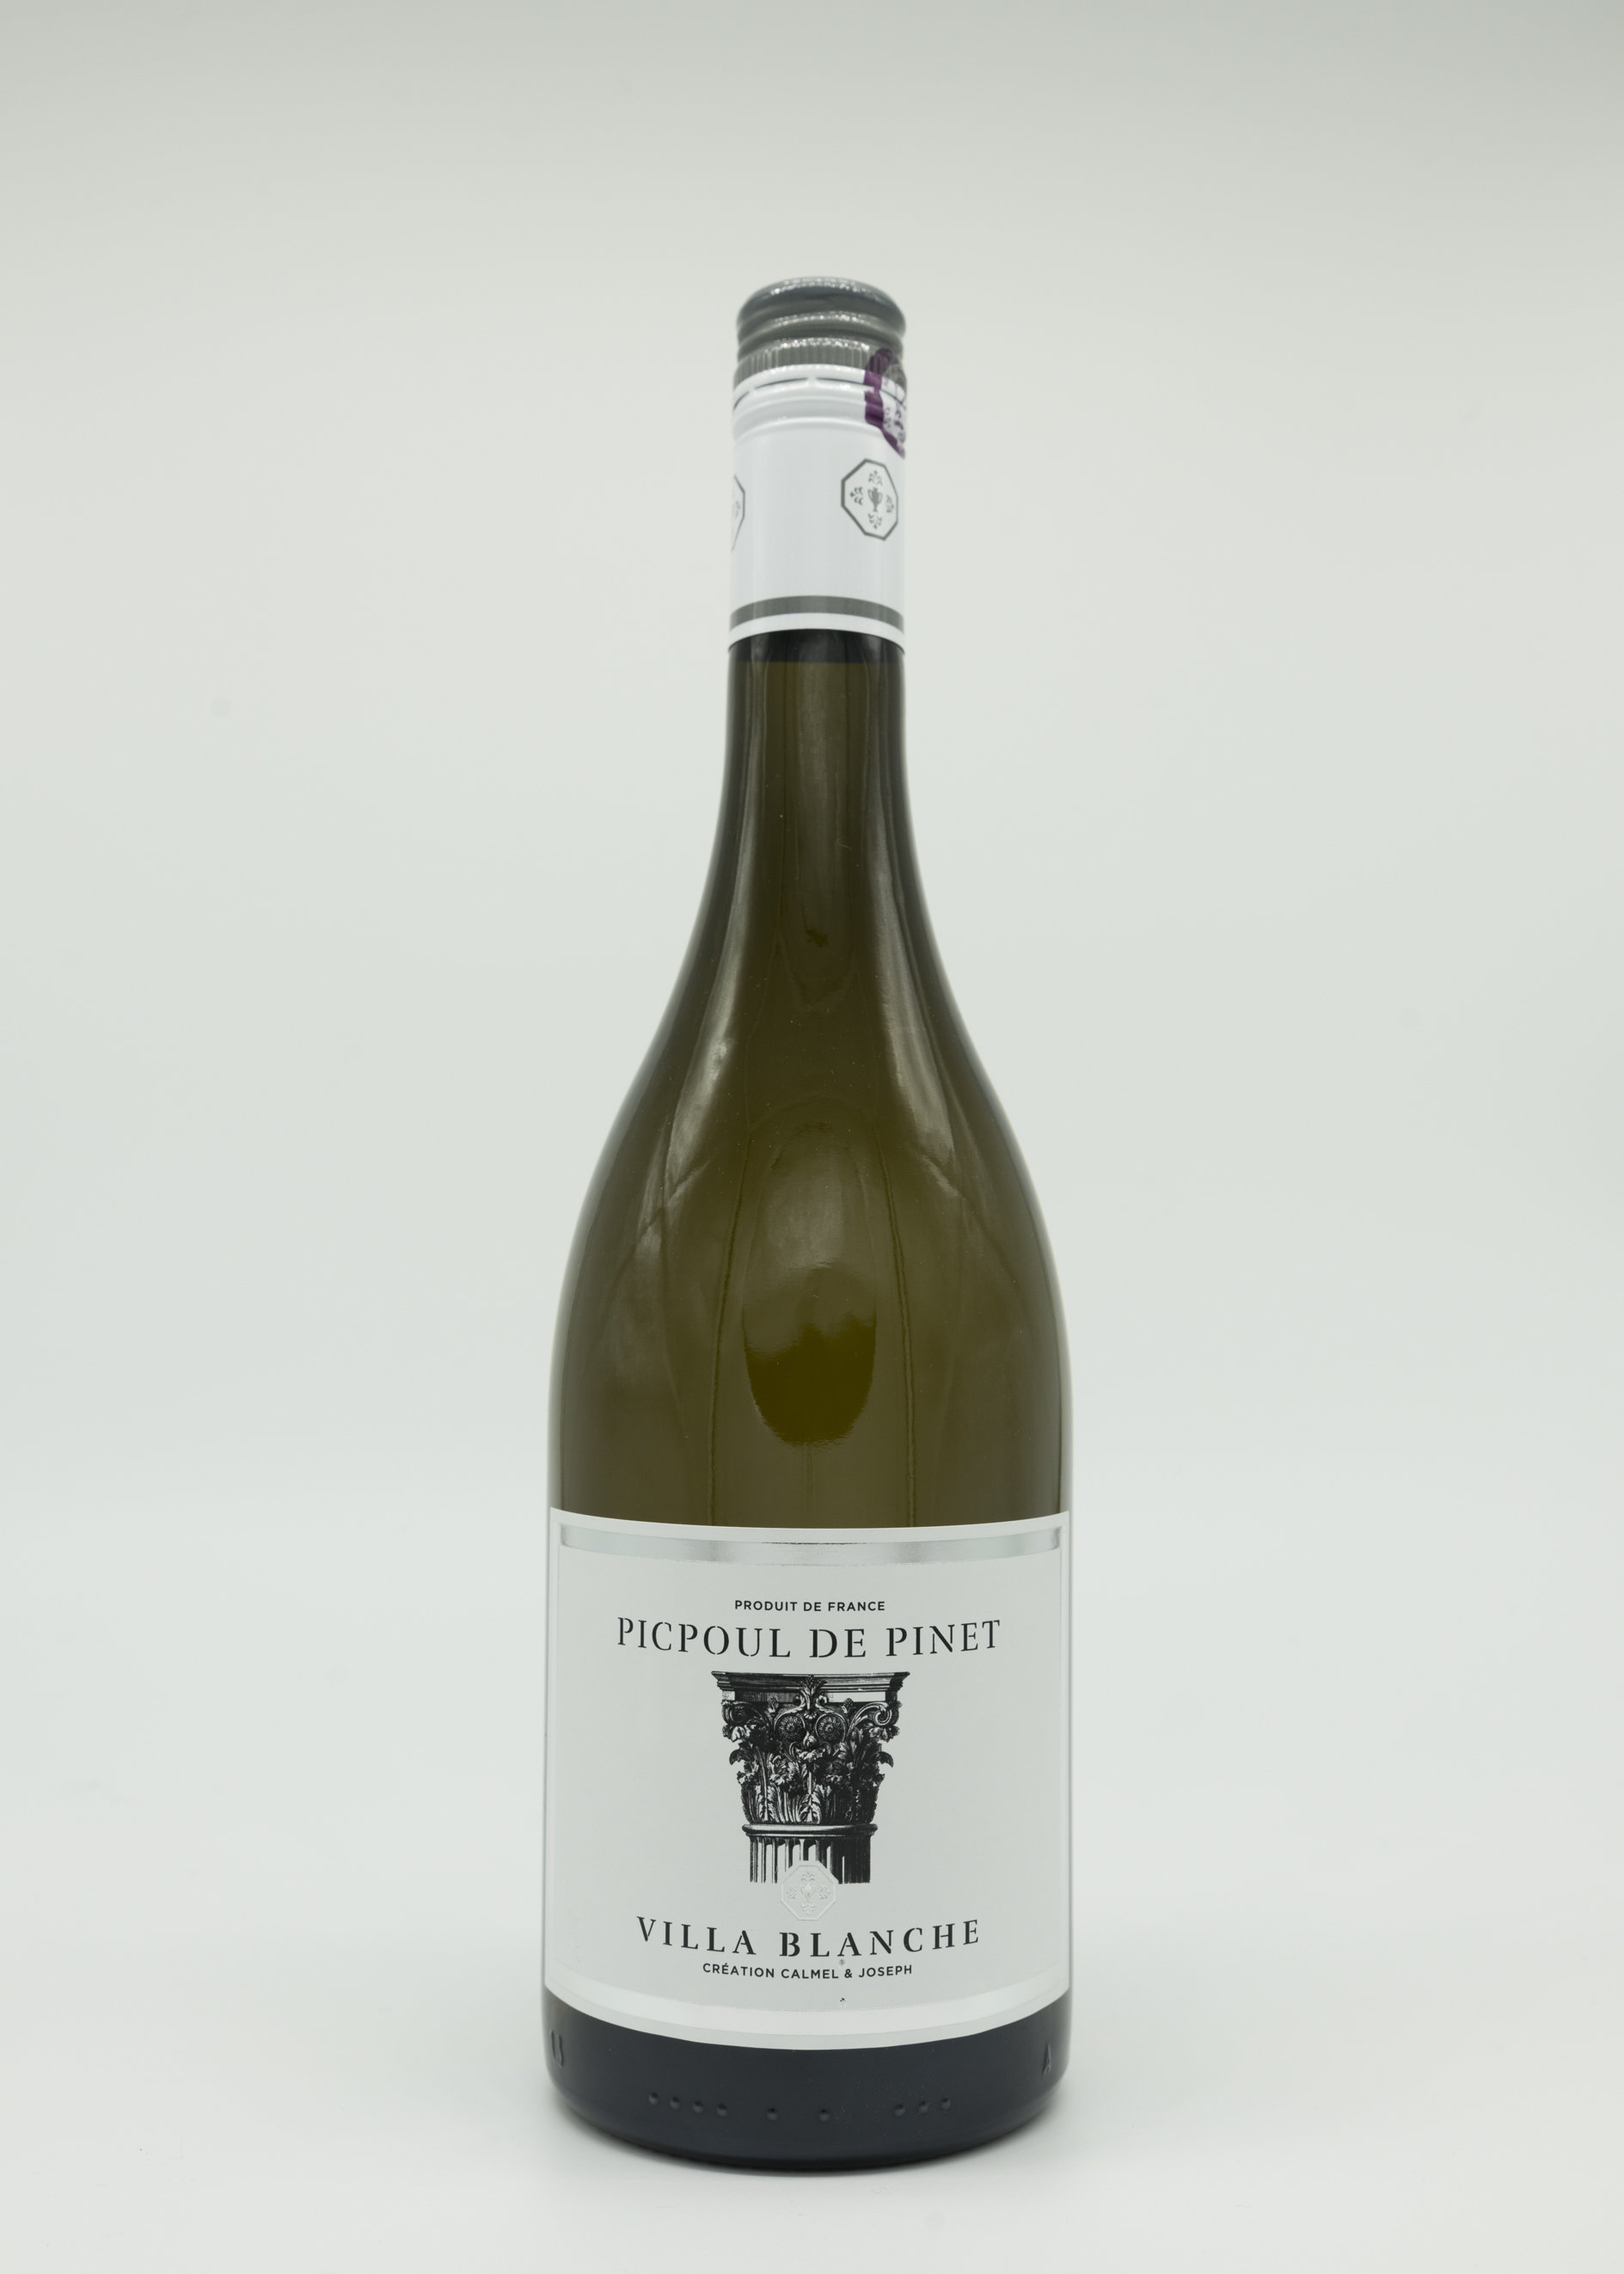 Picpoul de Pinet Villa Blanche, 2019 00032